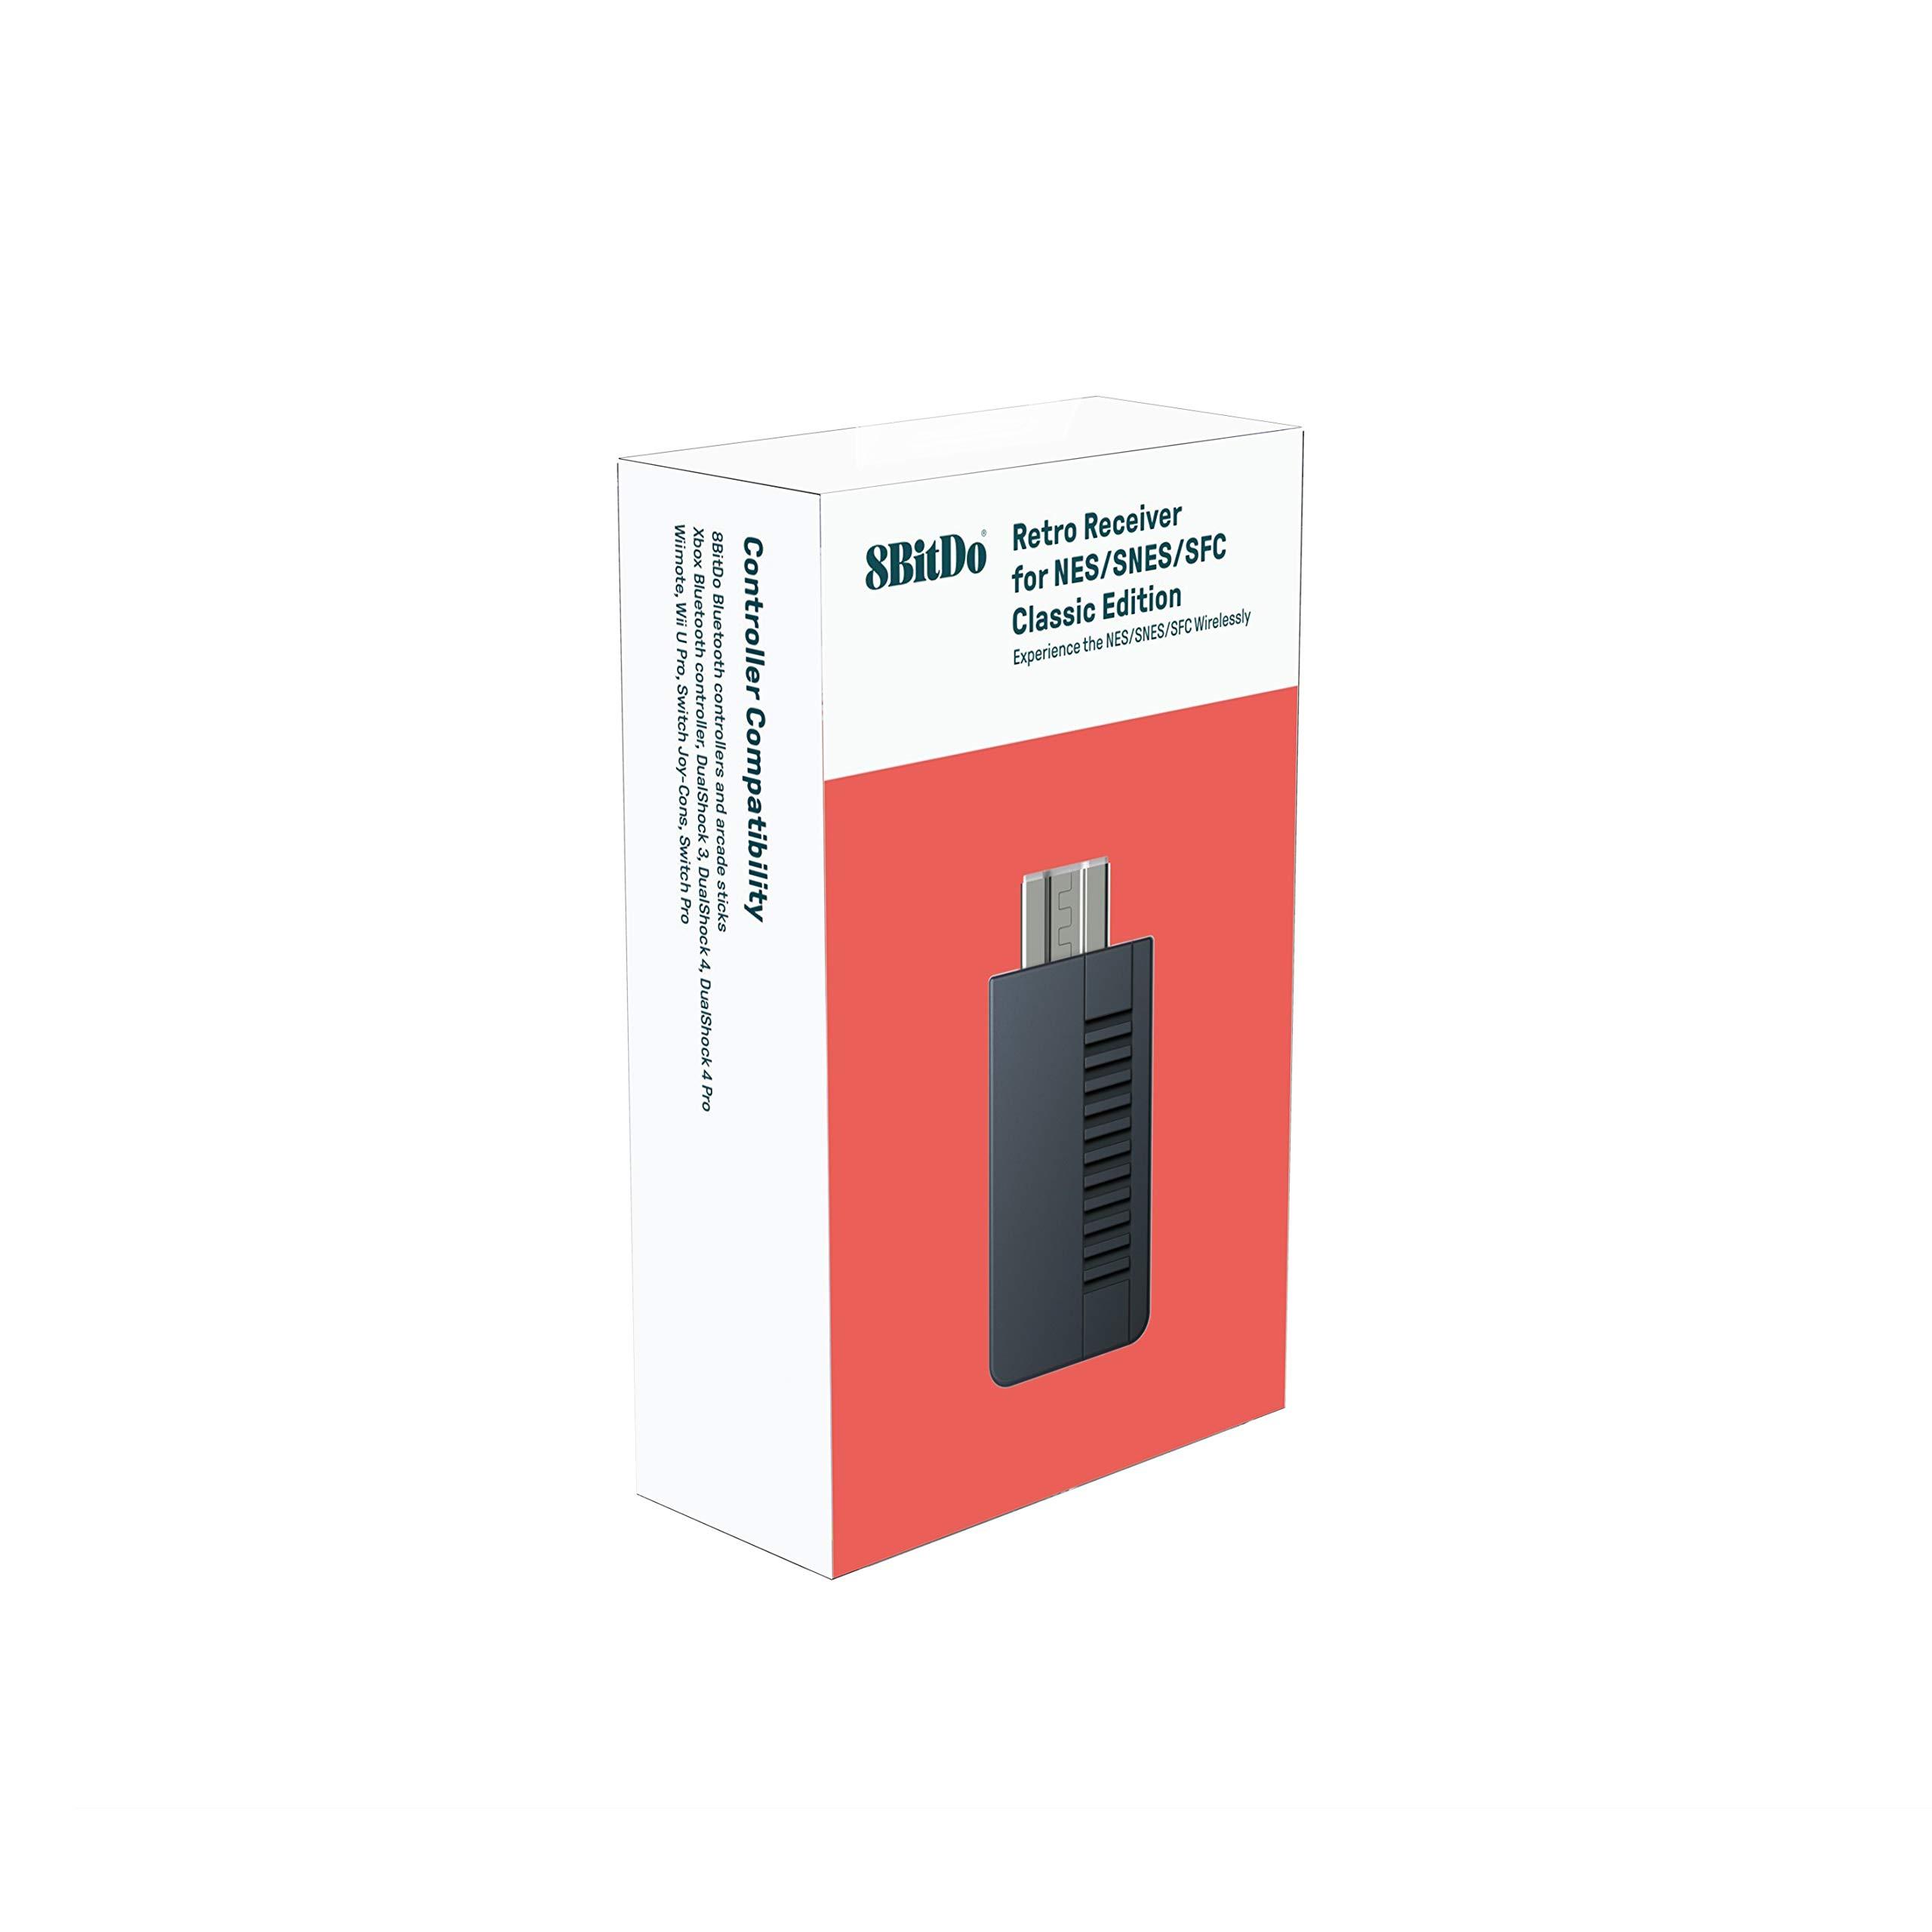 8Bitdo SN30 2.4G Wireless Controller for SNES Classic Edition [nintendo_super_NES] by 8Bitdo (Image #3)